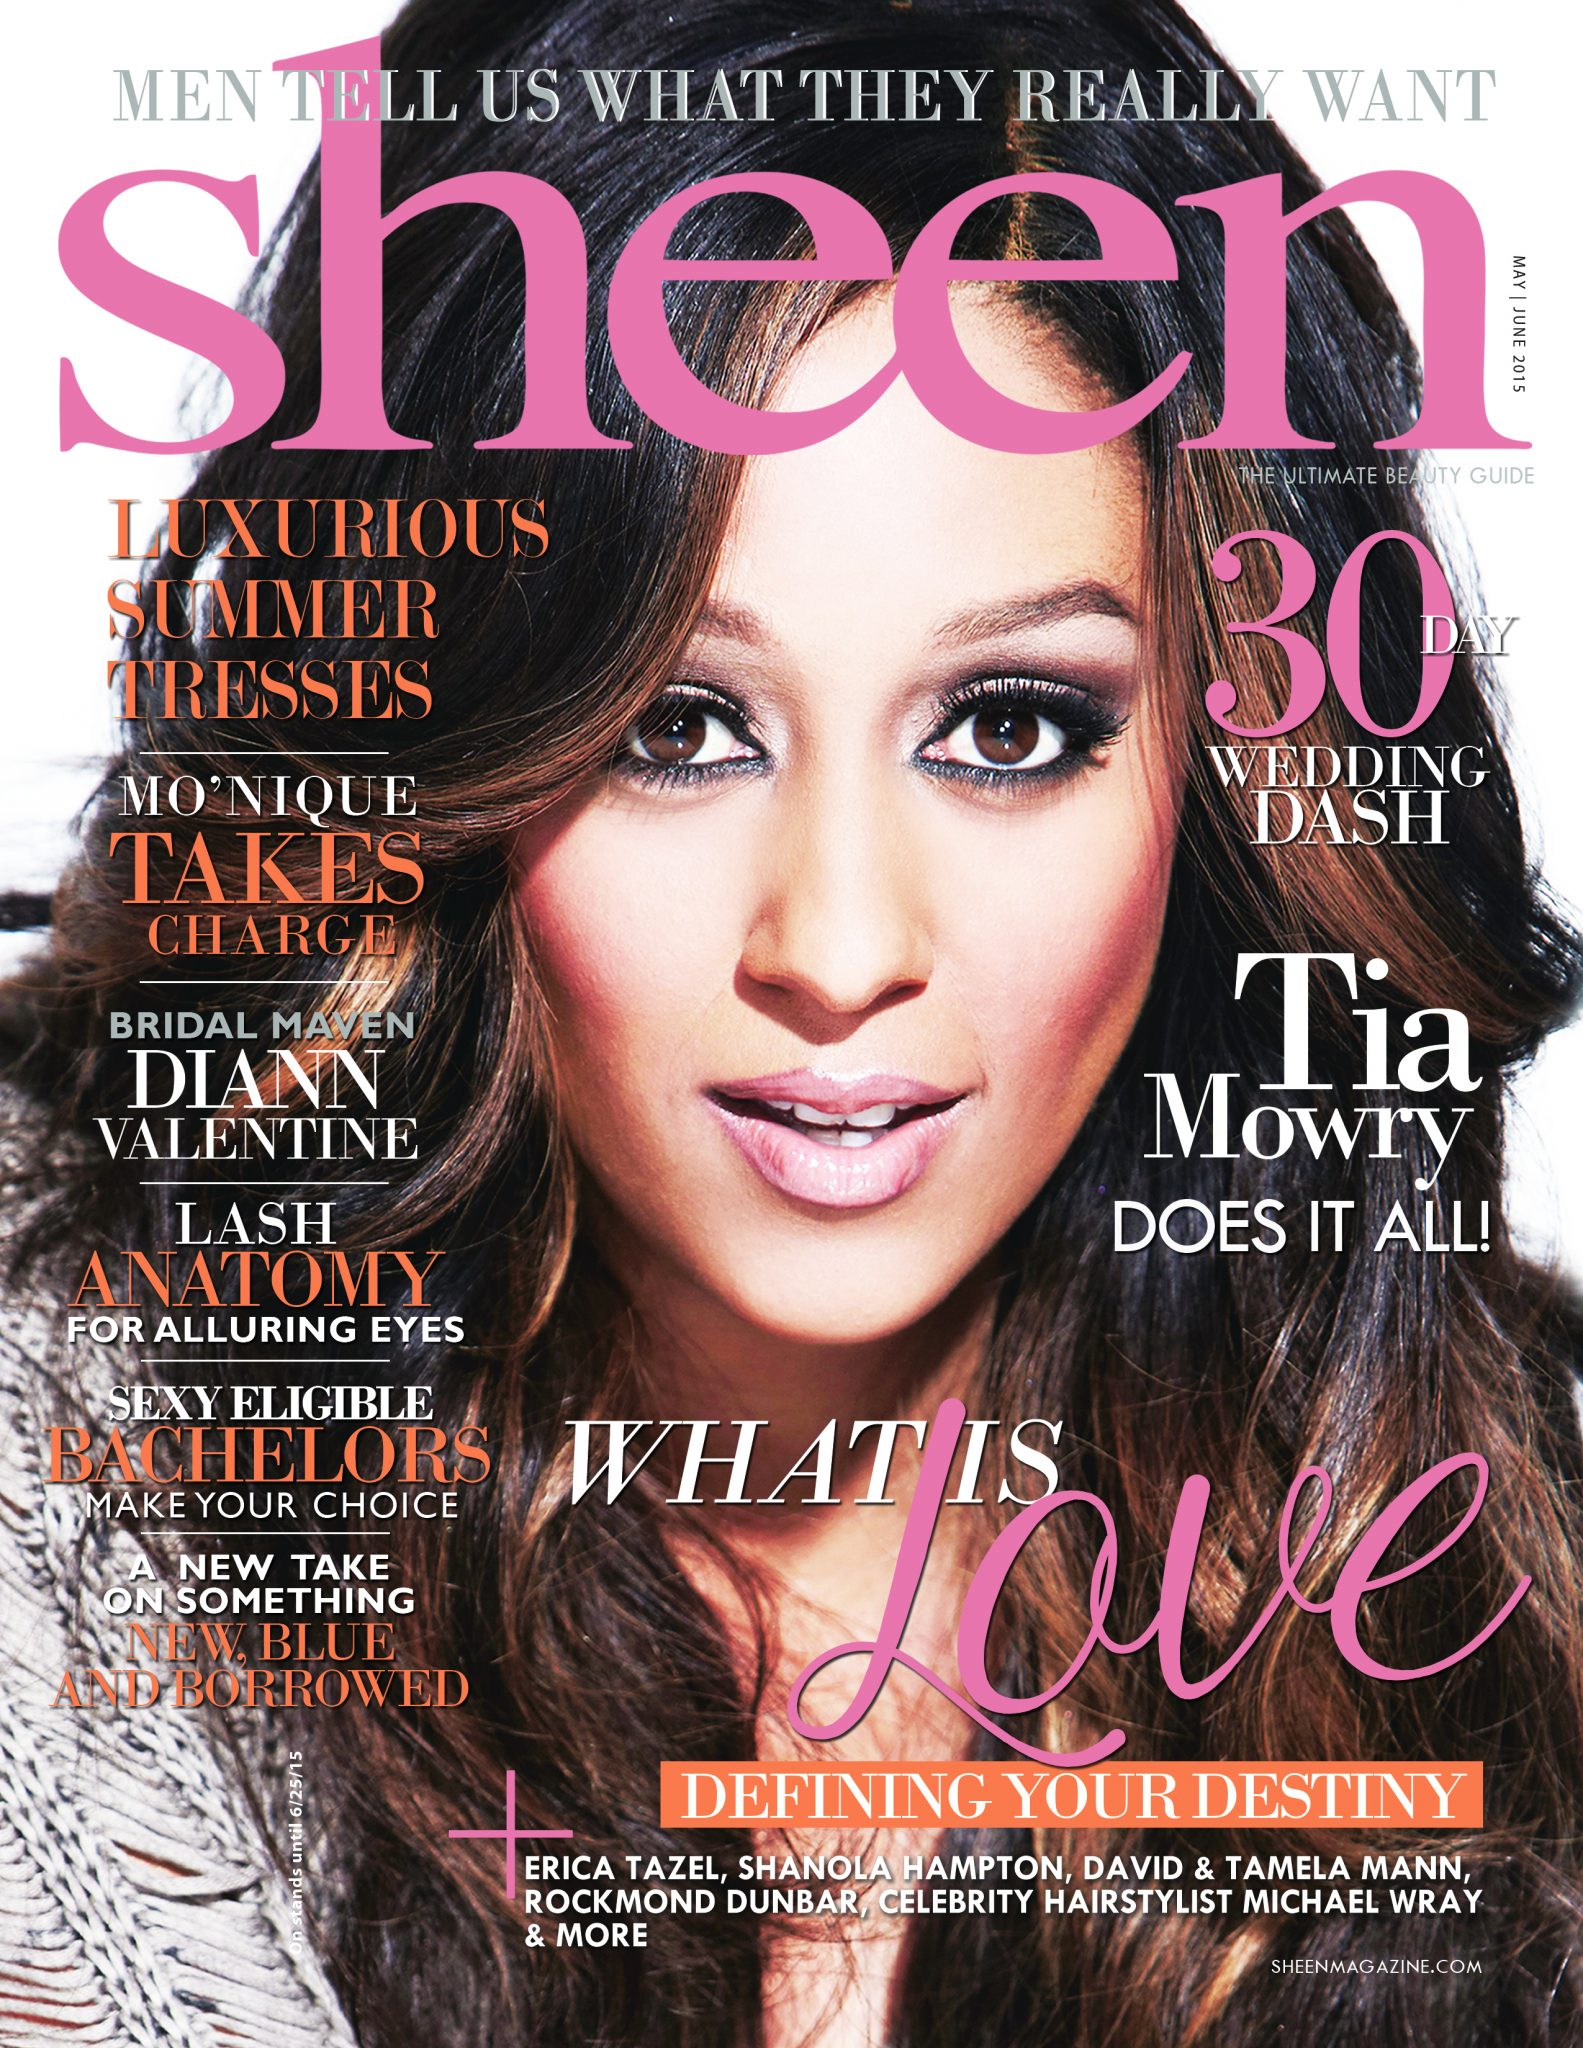 Tia Mowry For Sheen Magazine